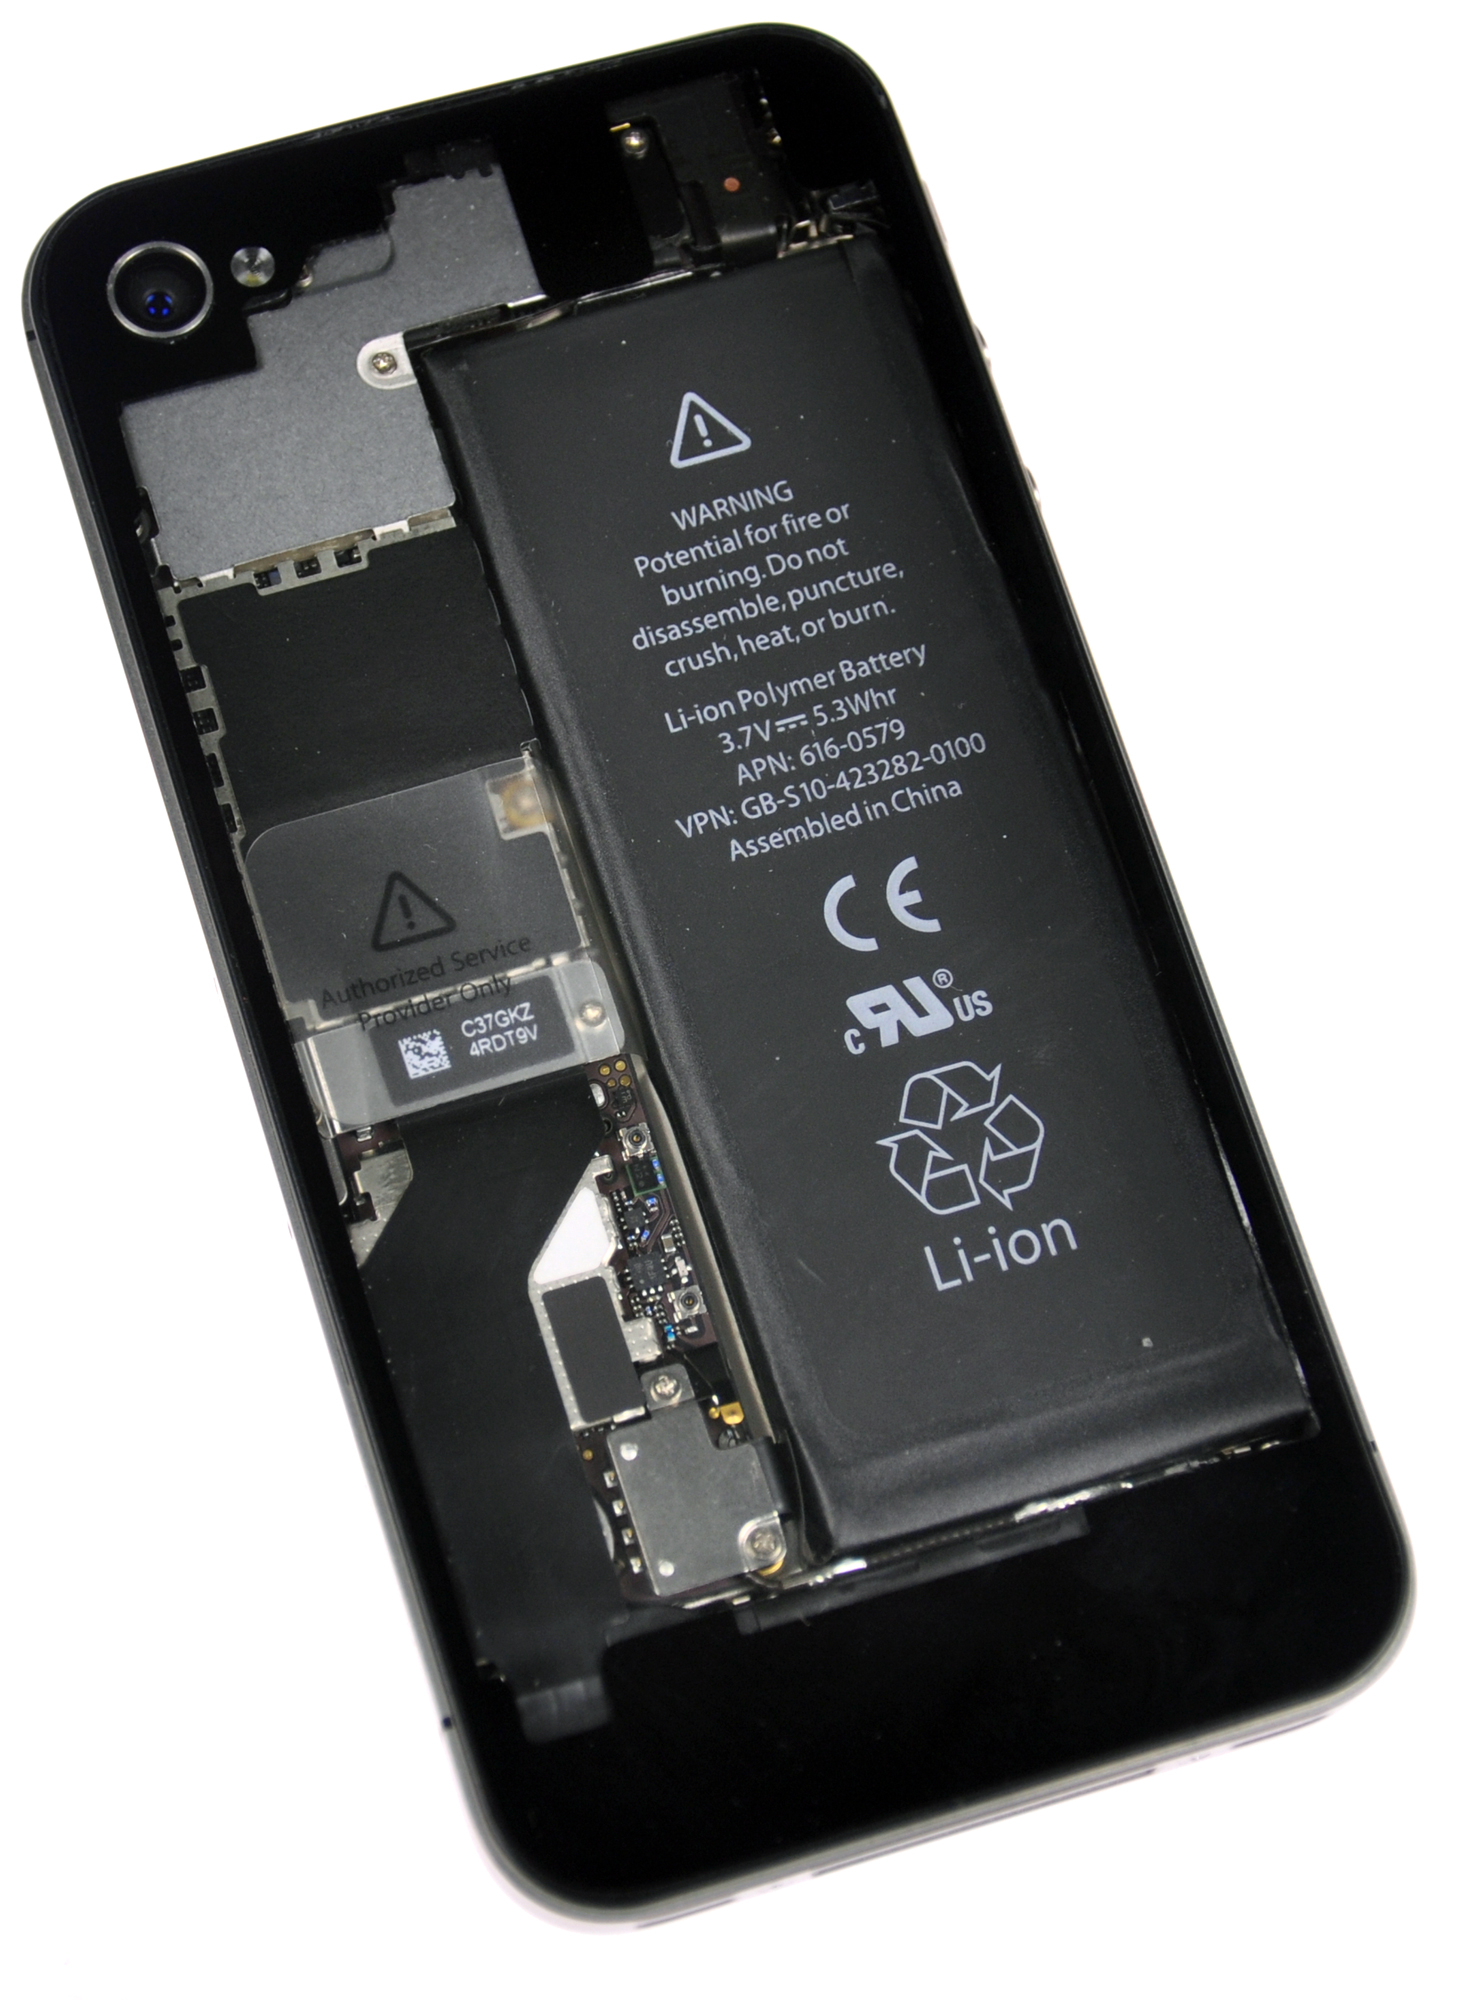 iPhone 4s com o Revelation Kit da iFixit